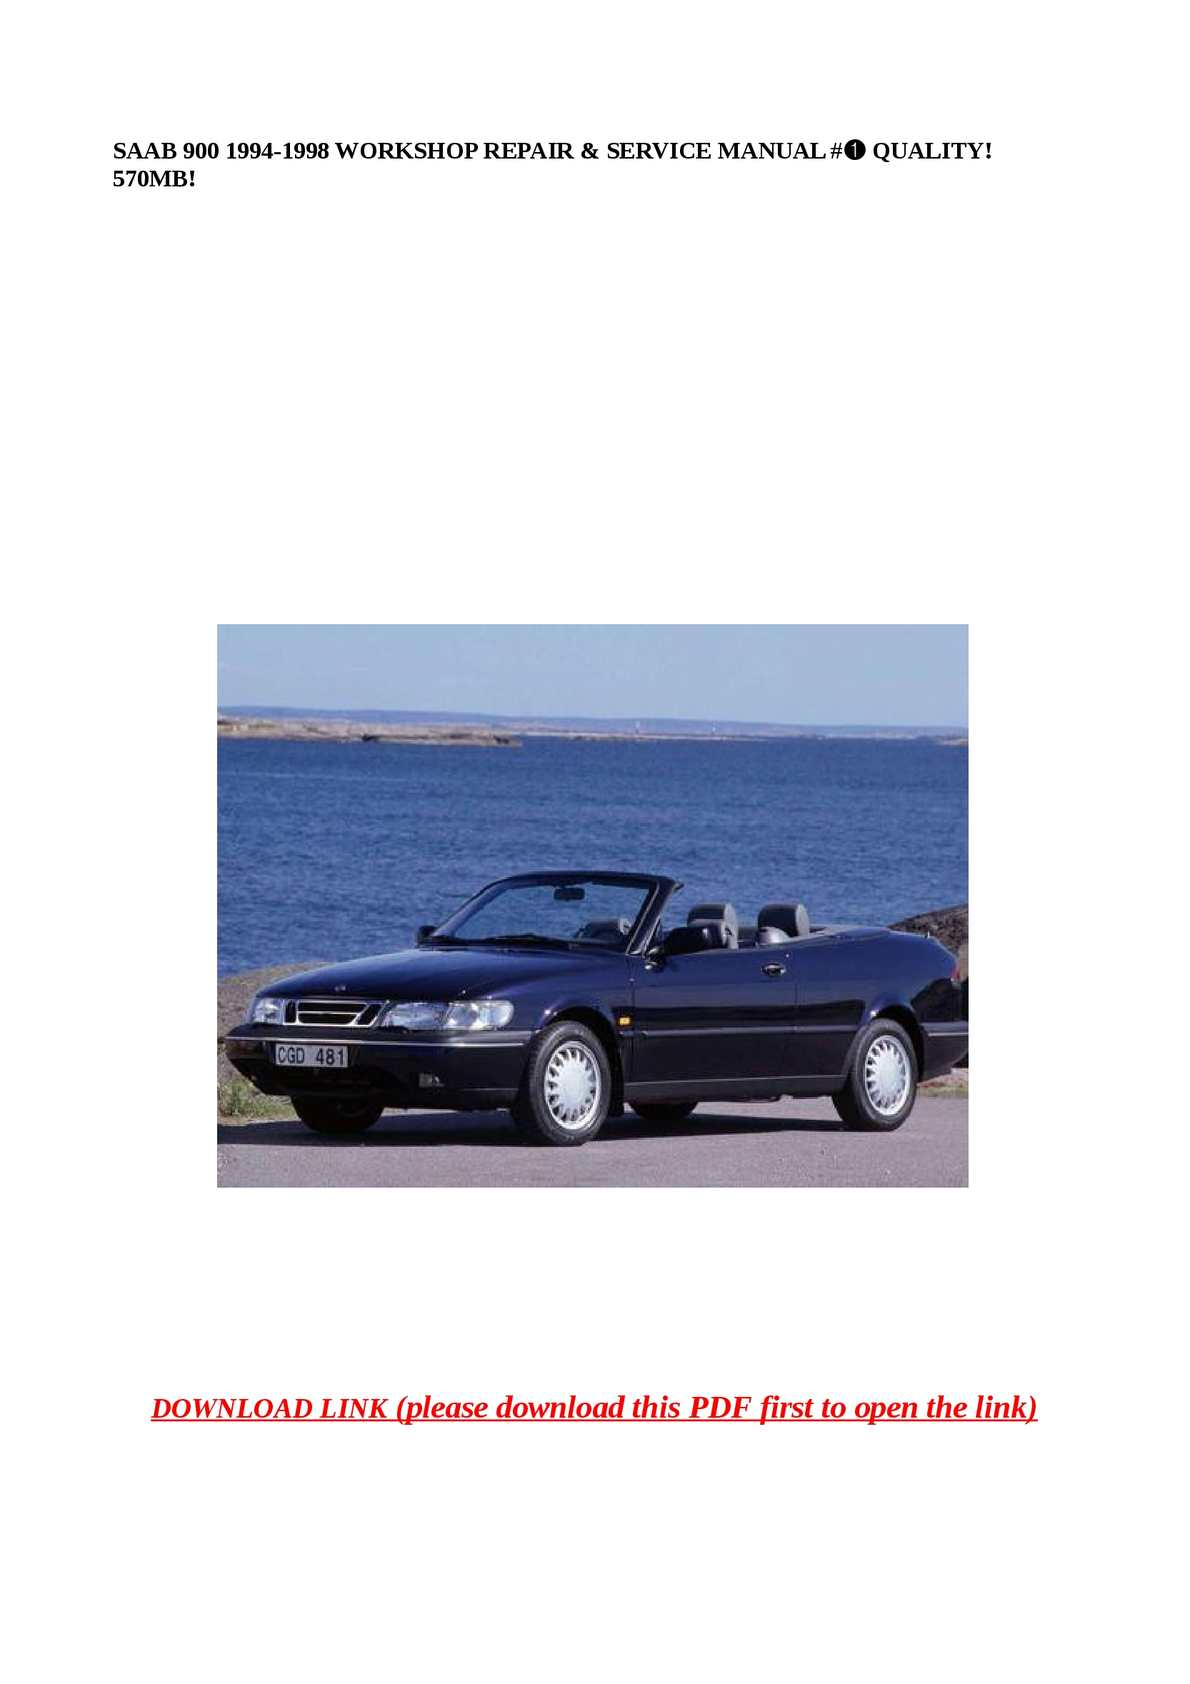 Calaméo - SAAB 900 1994-1998 WORKSHOP REPAIR & SERVICE MANUAL #➀ QUALITY!  570MB!